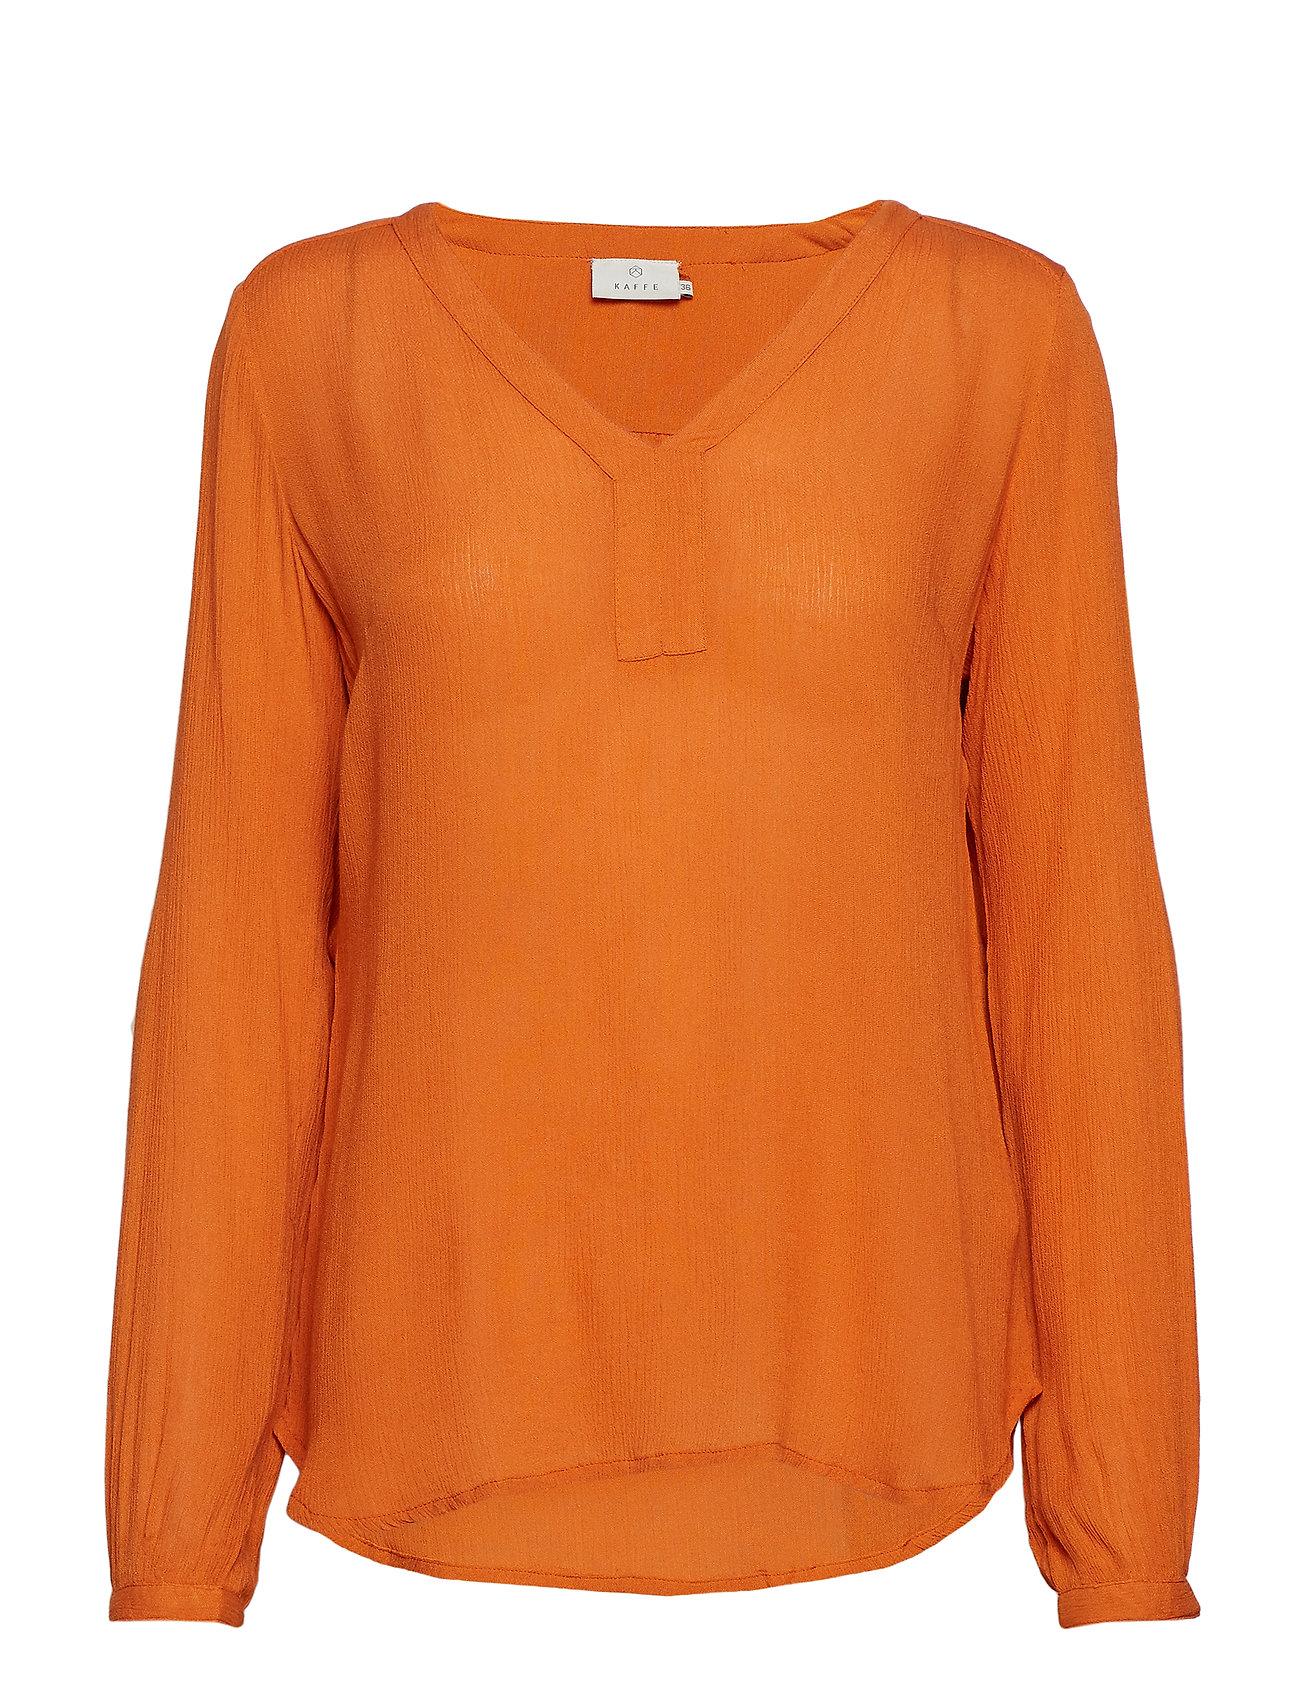 Amber OrangeKaffe L s BlouseMin 2burnt XPZiuOk